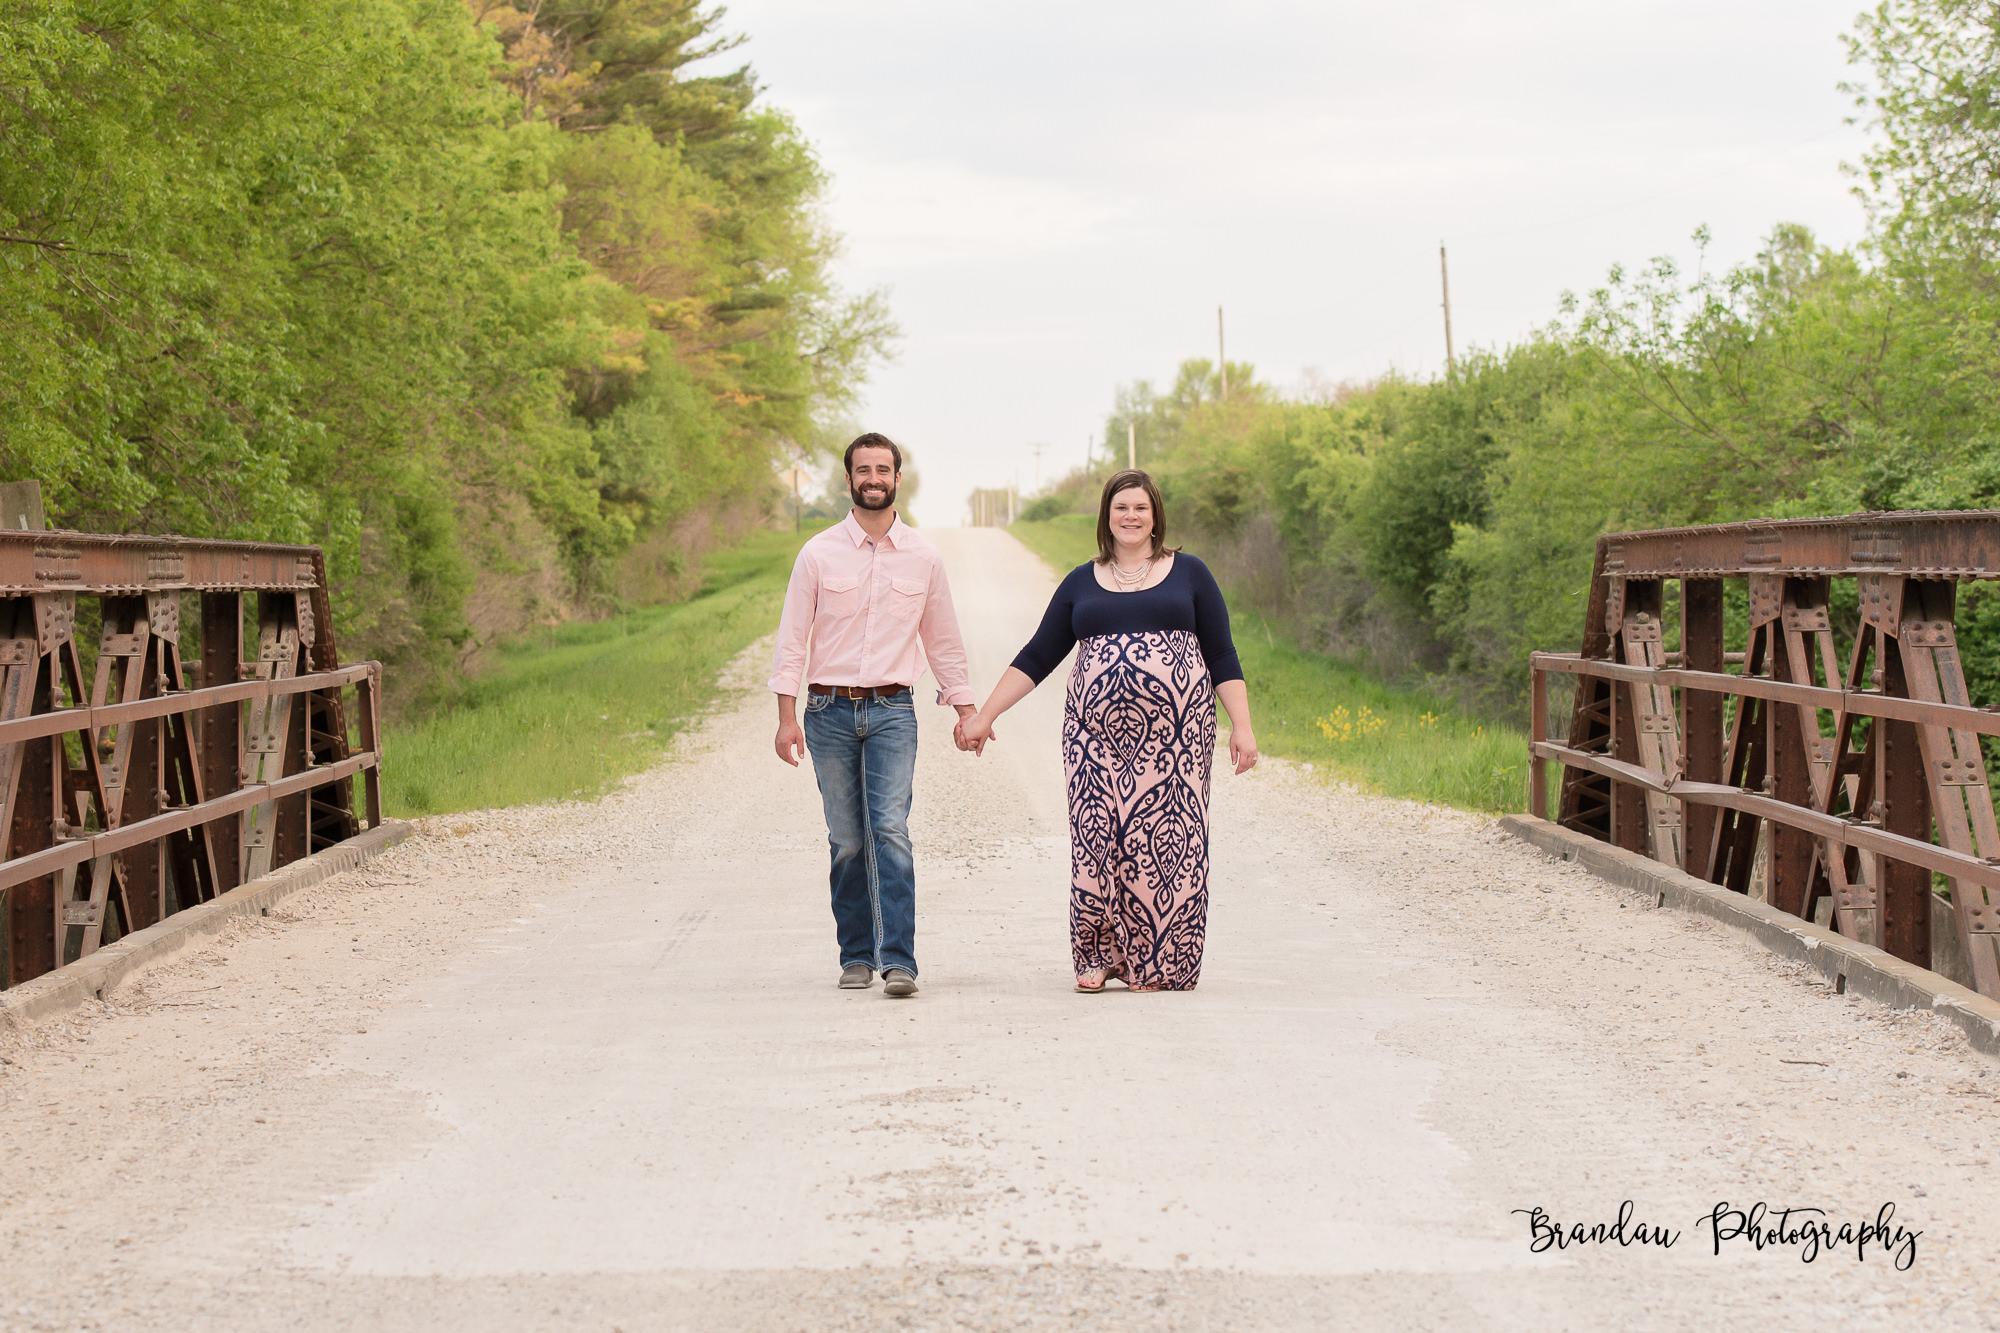 Engagement Bridge North Central Iowa_Brandau Photography-26.jpg